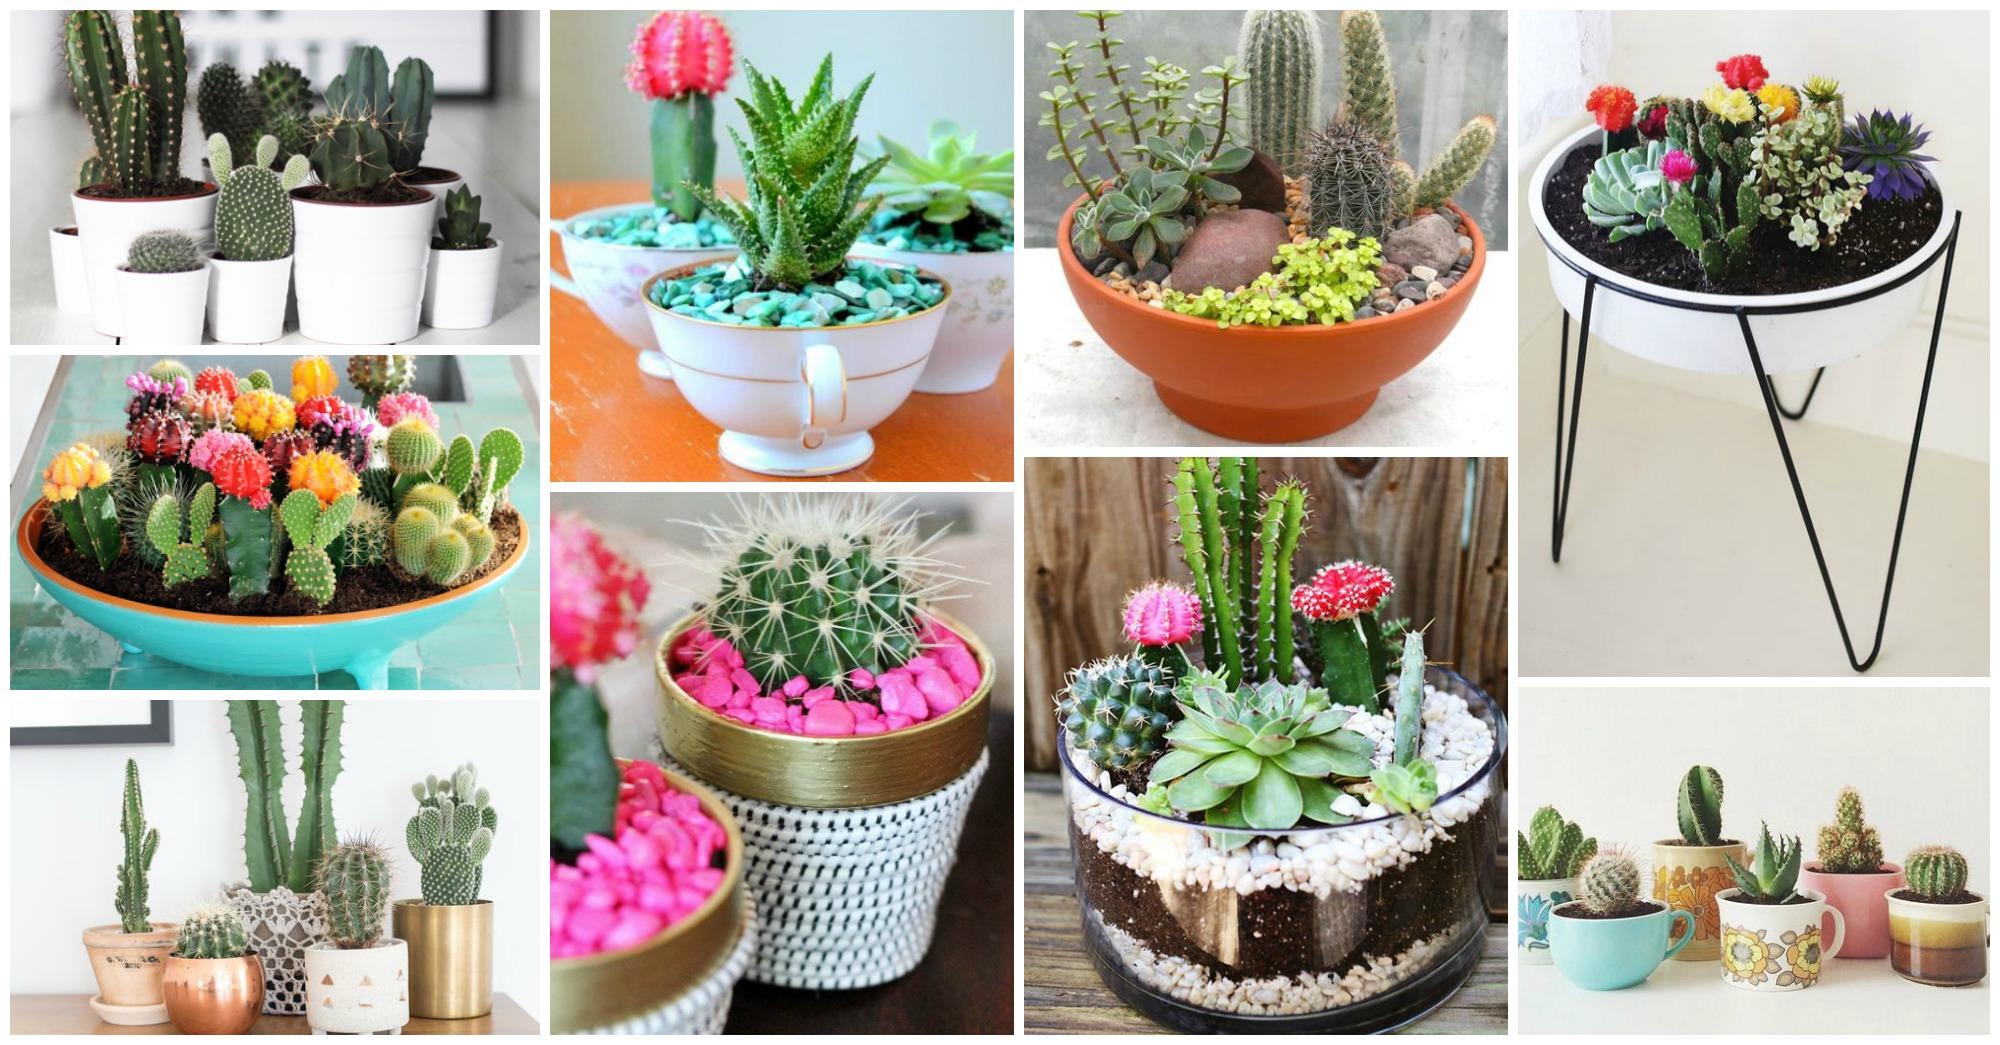 Smart Tips For Growing Cactus Indoors